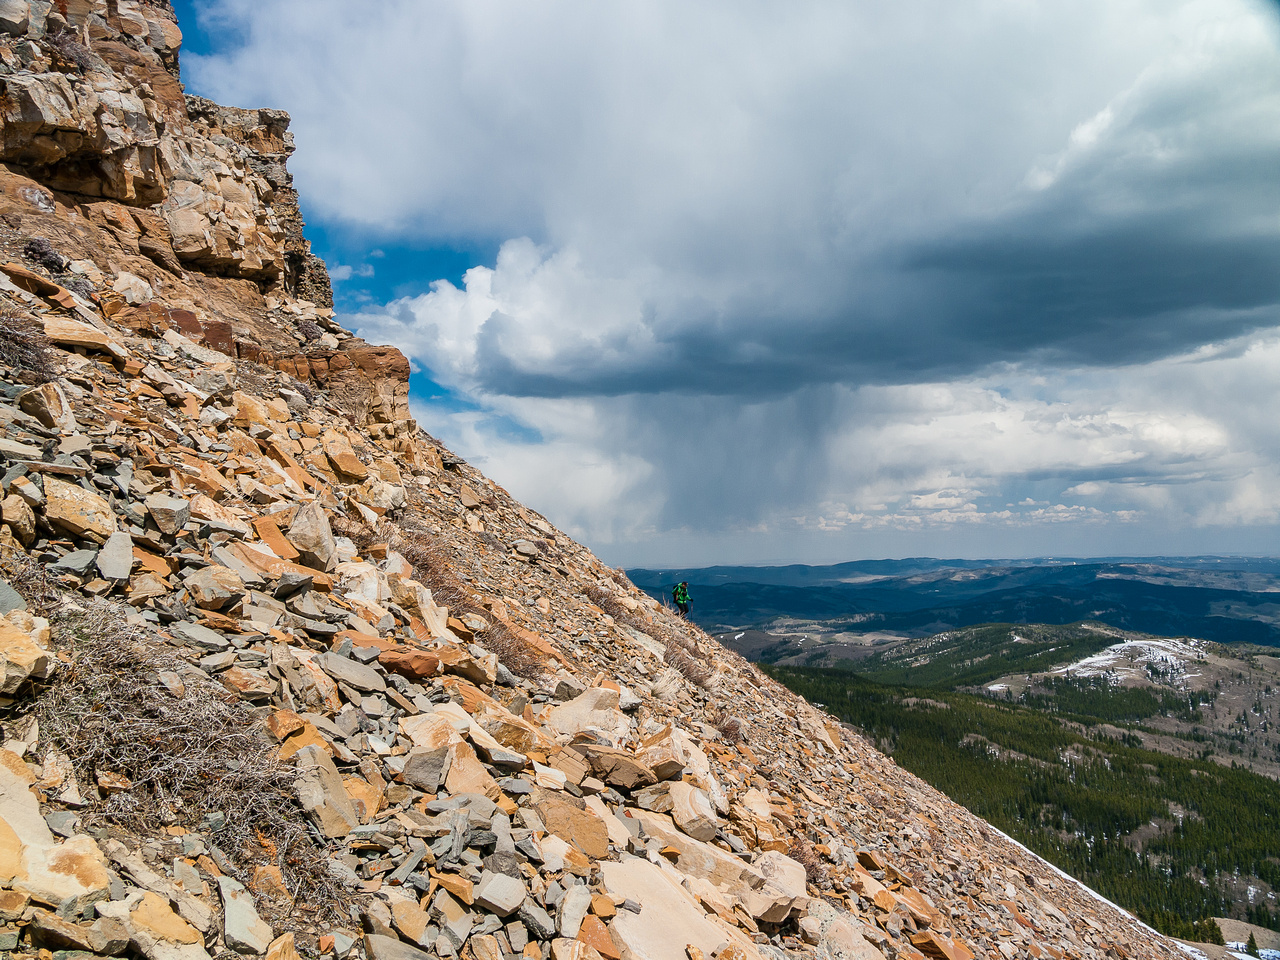 Descending scree slopes towards Horseshoe Ridge.